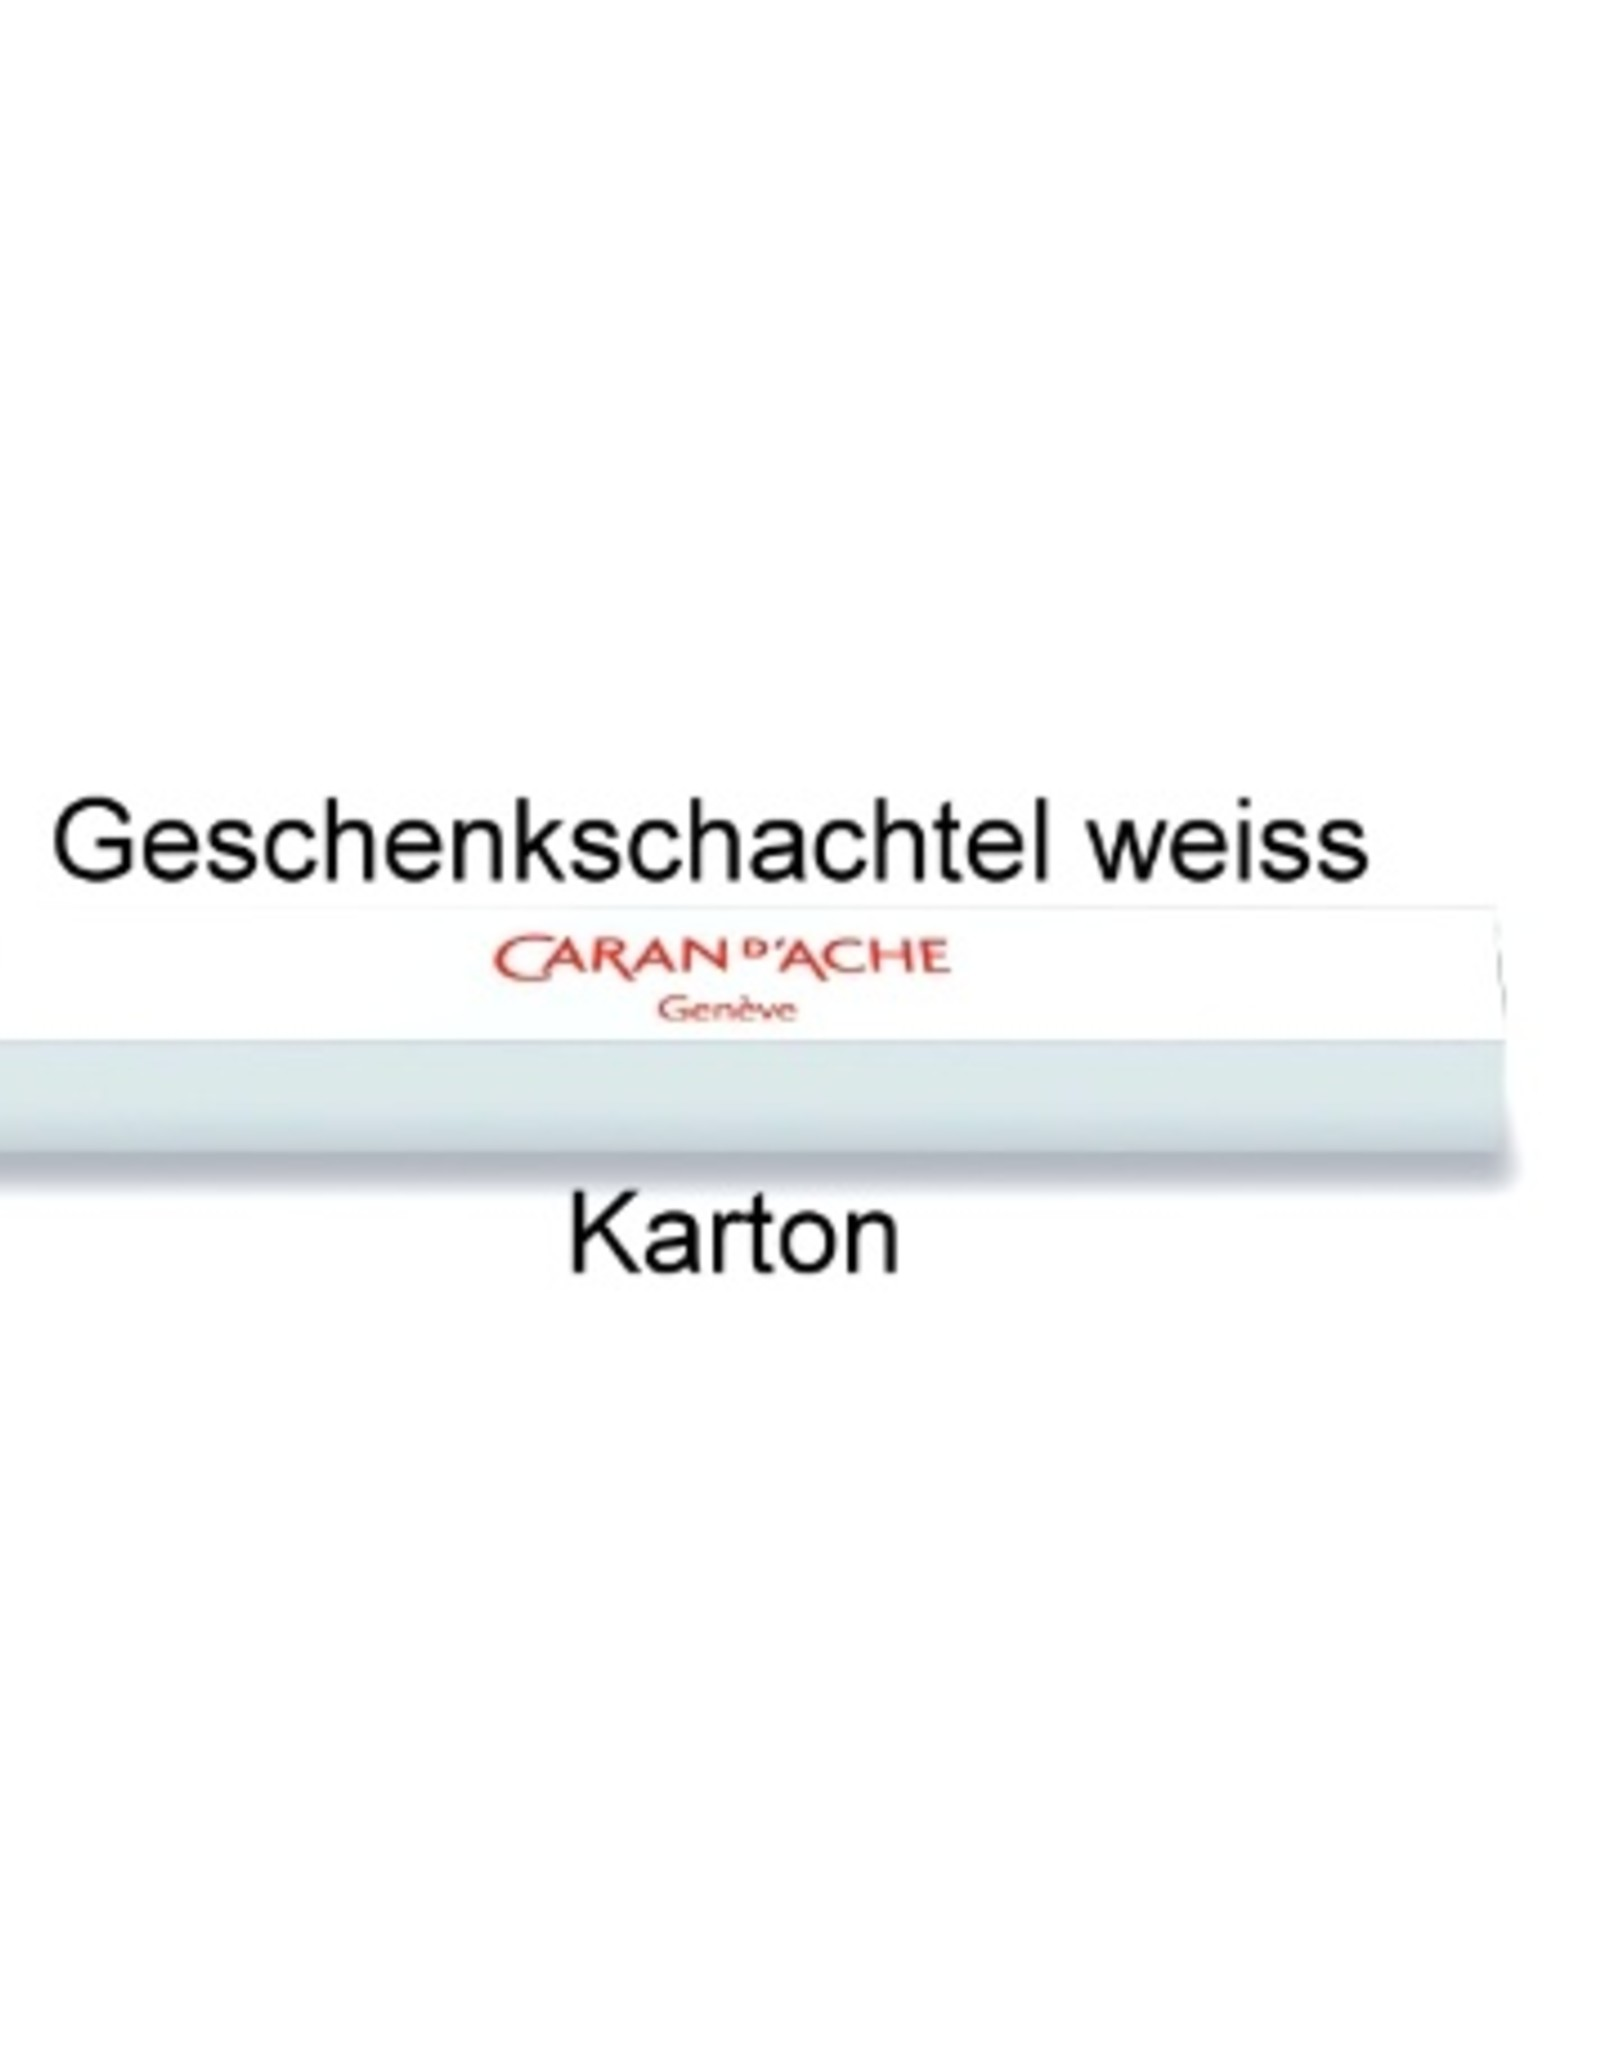 Caran d'Ache Kugelschreiber oder Minenbleistift mit Gravur 849  Classic Line schwarz